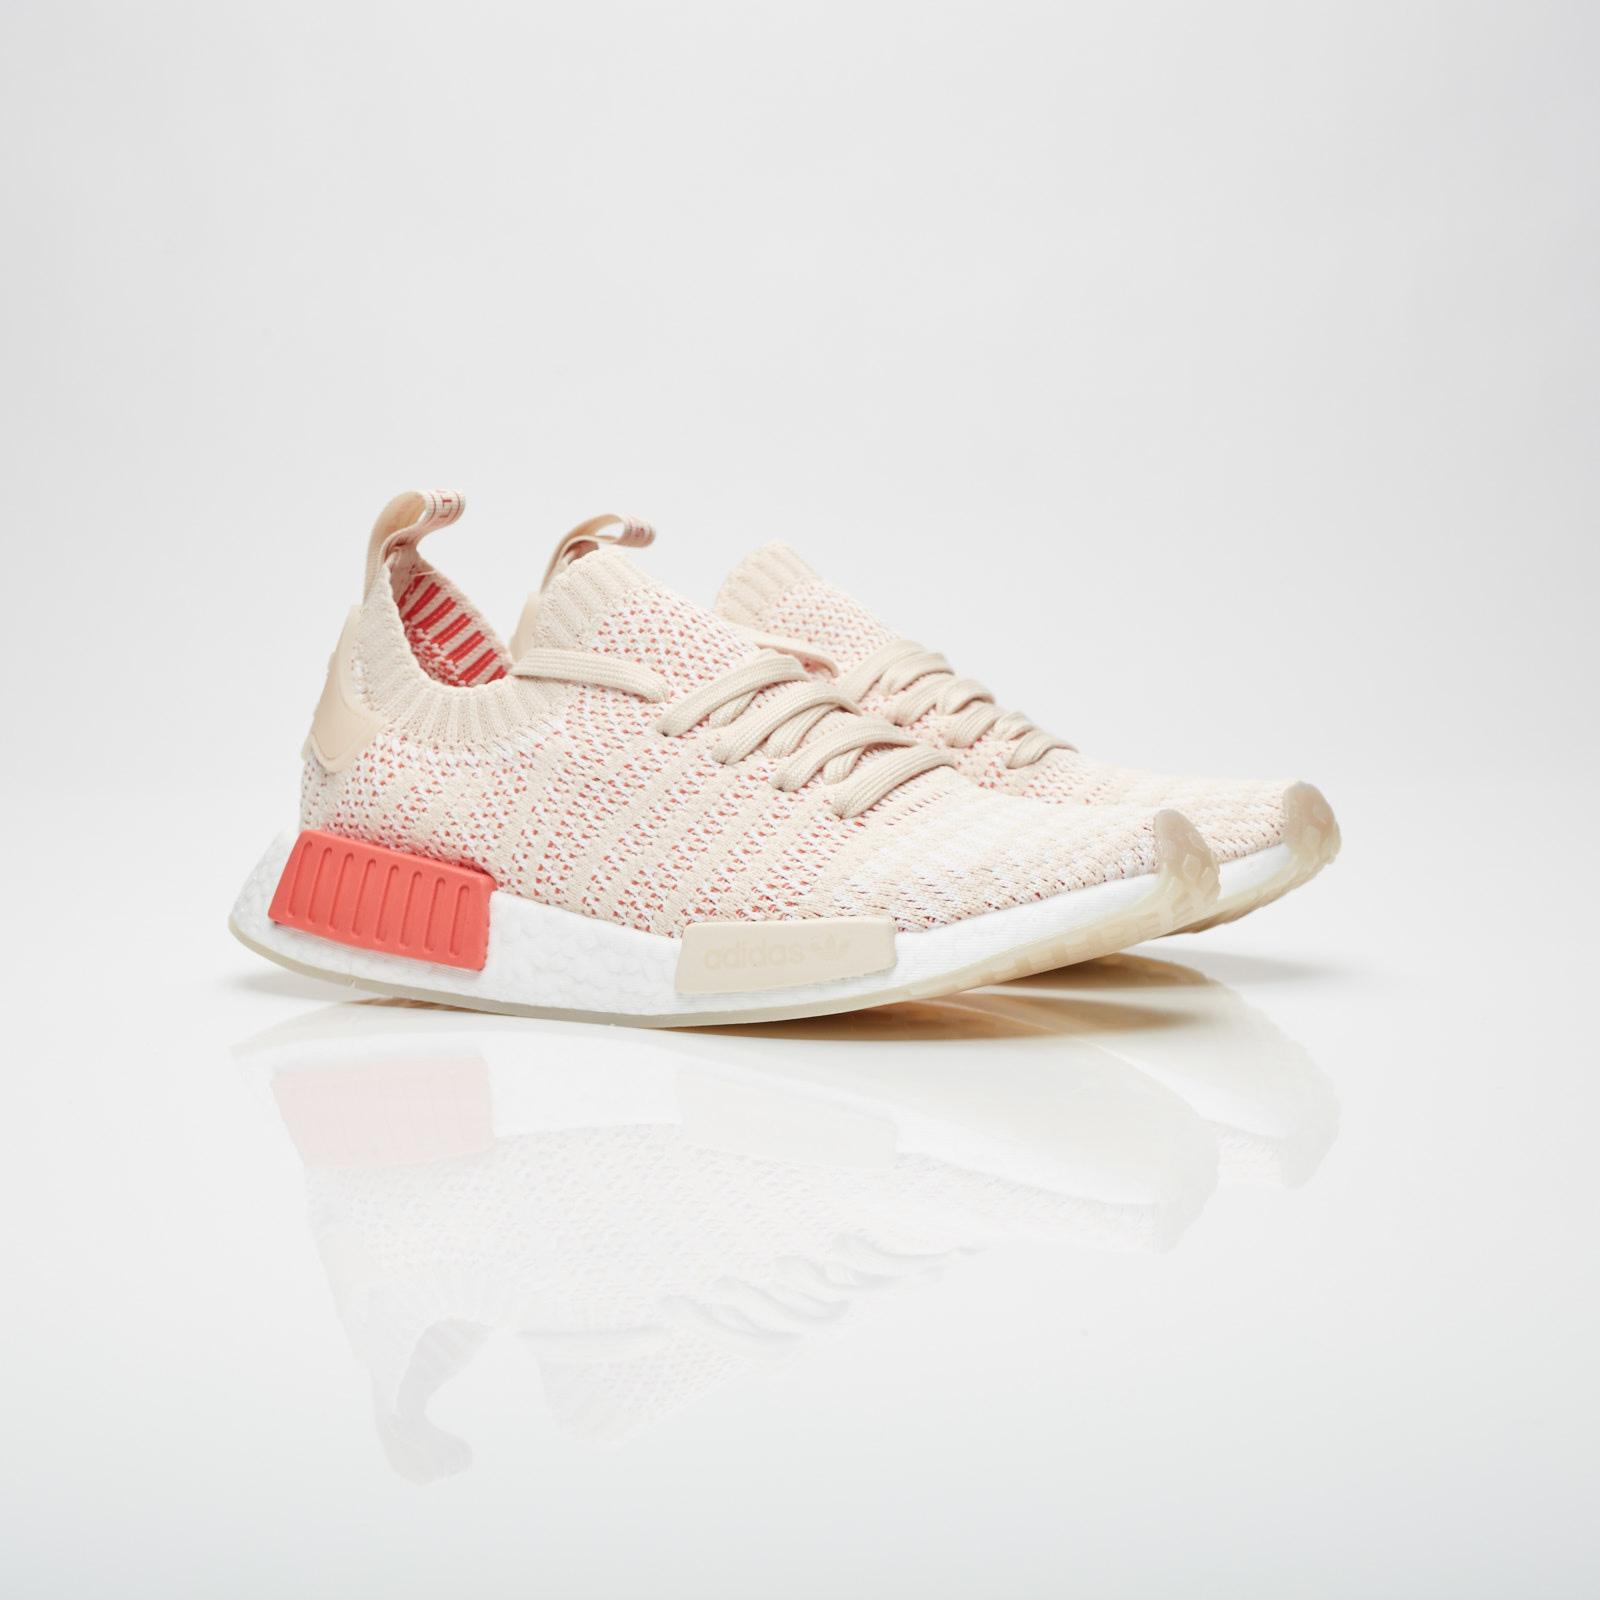 Sneakers Sneakersnstuff W Adidas Stlt Nmd Pk R1 Cq2030 4HOnzqnR1w